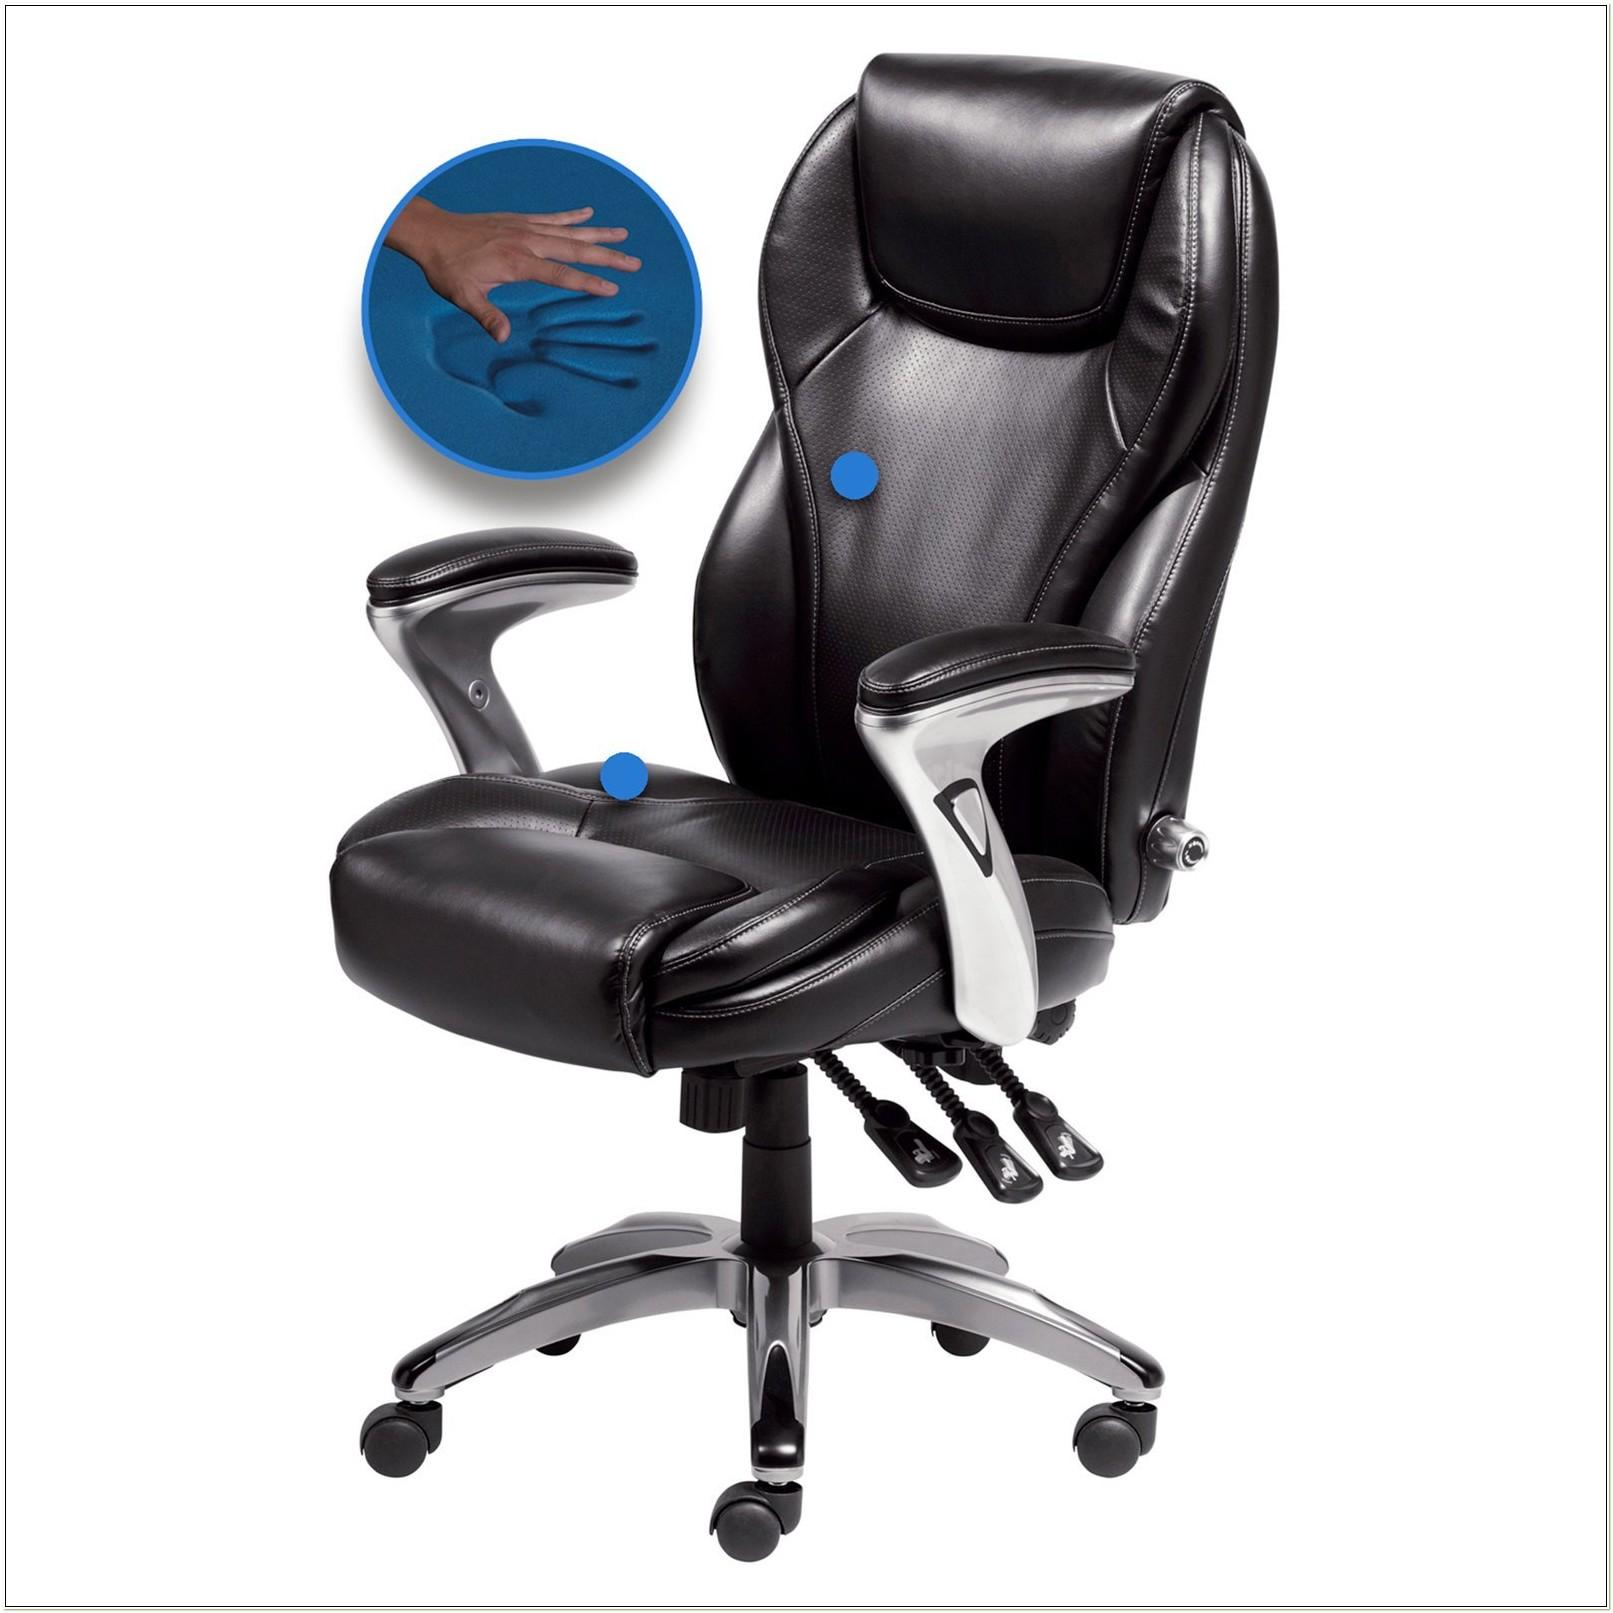 Serta Bonded Leather Ergo Executive Office Chair